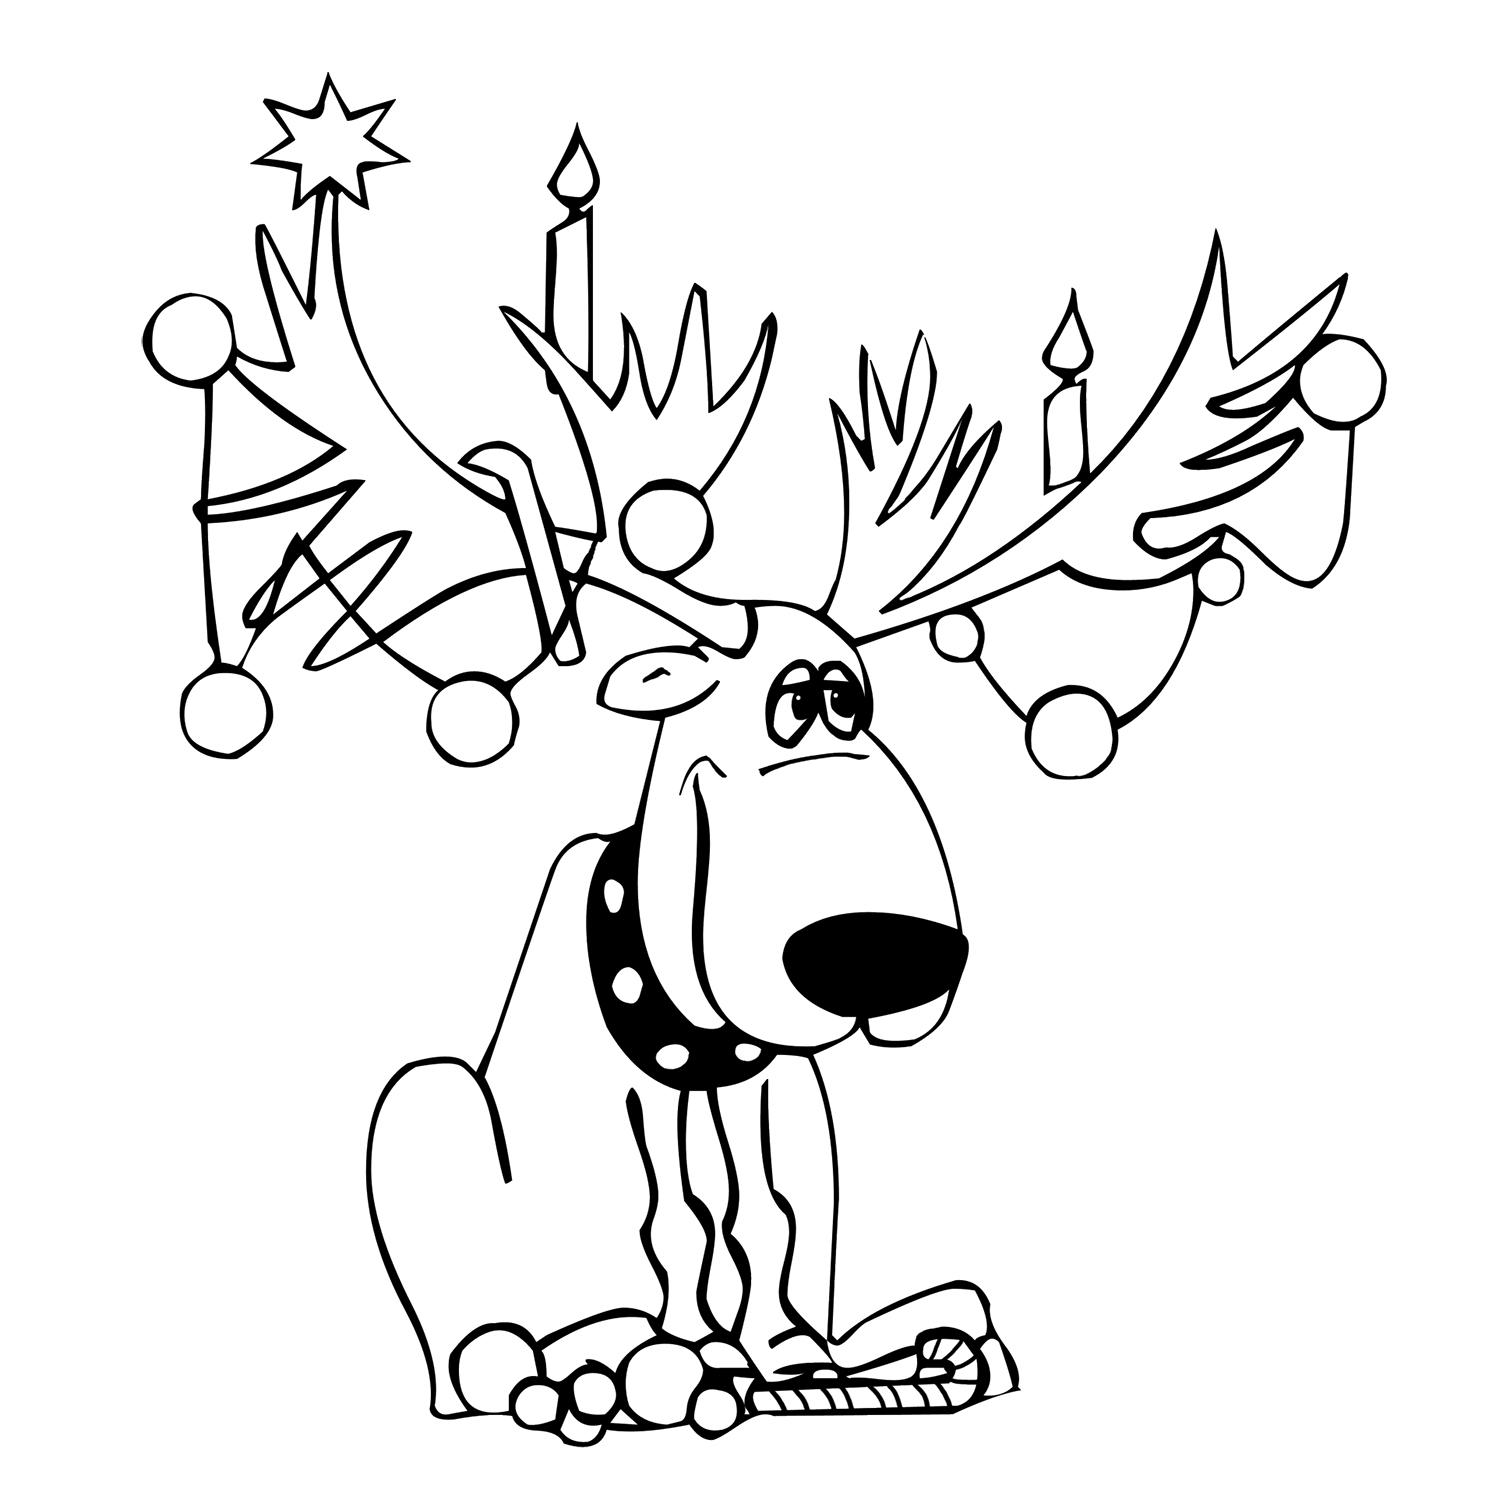 Funny coloring moose made up like Christmas tree